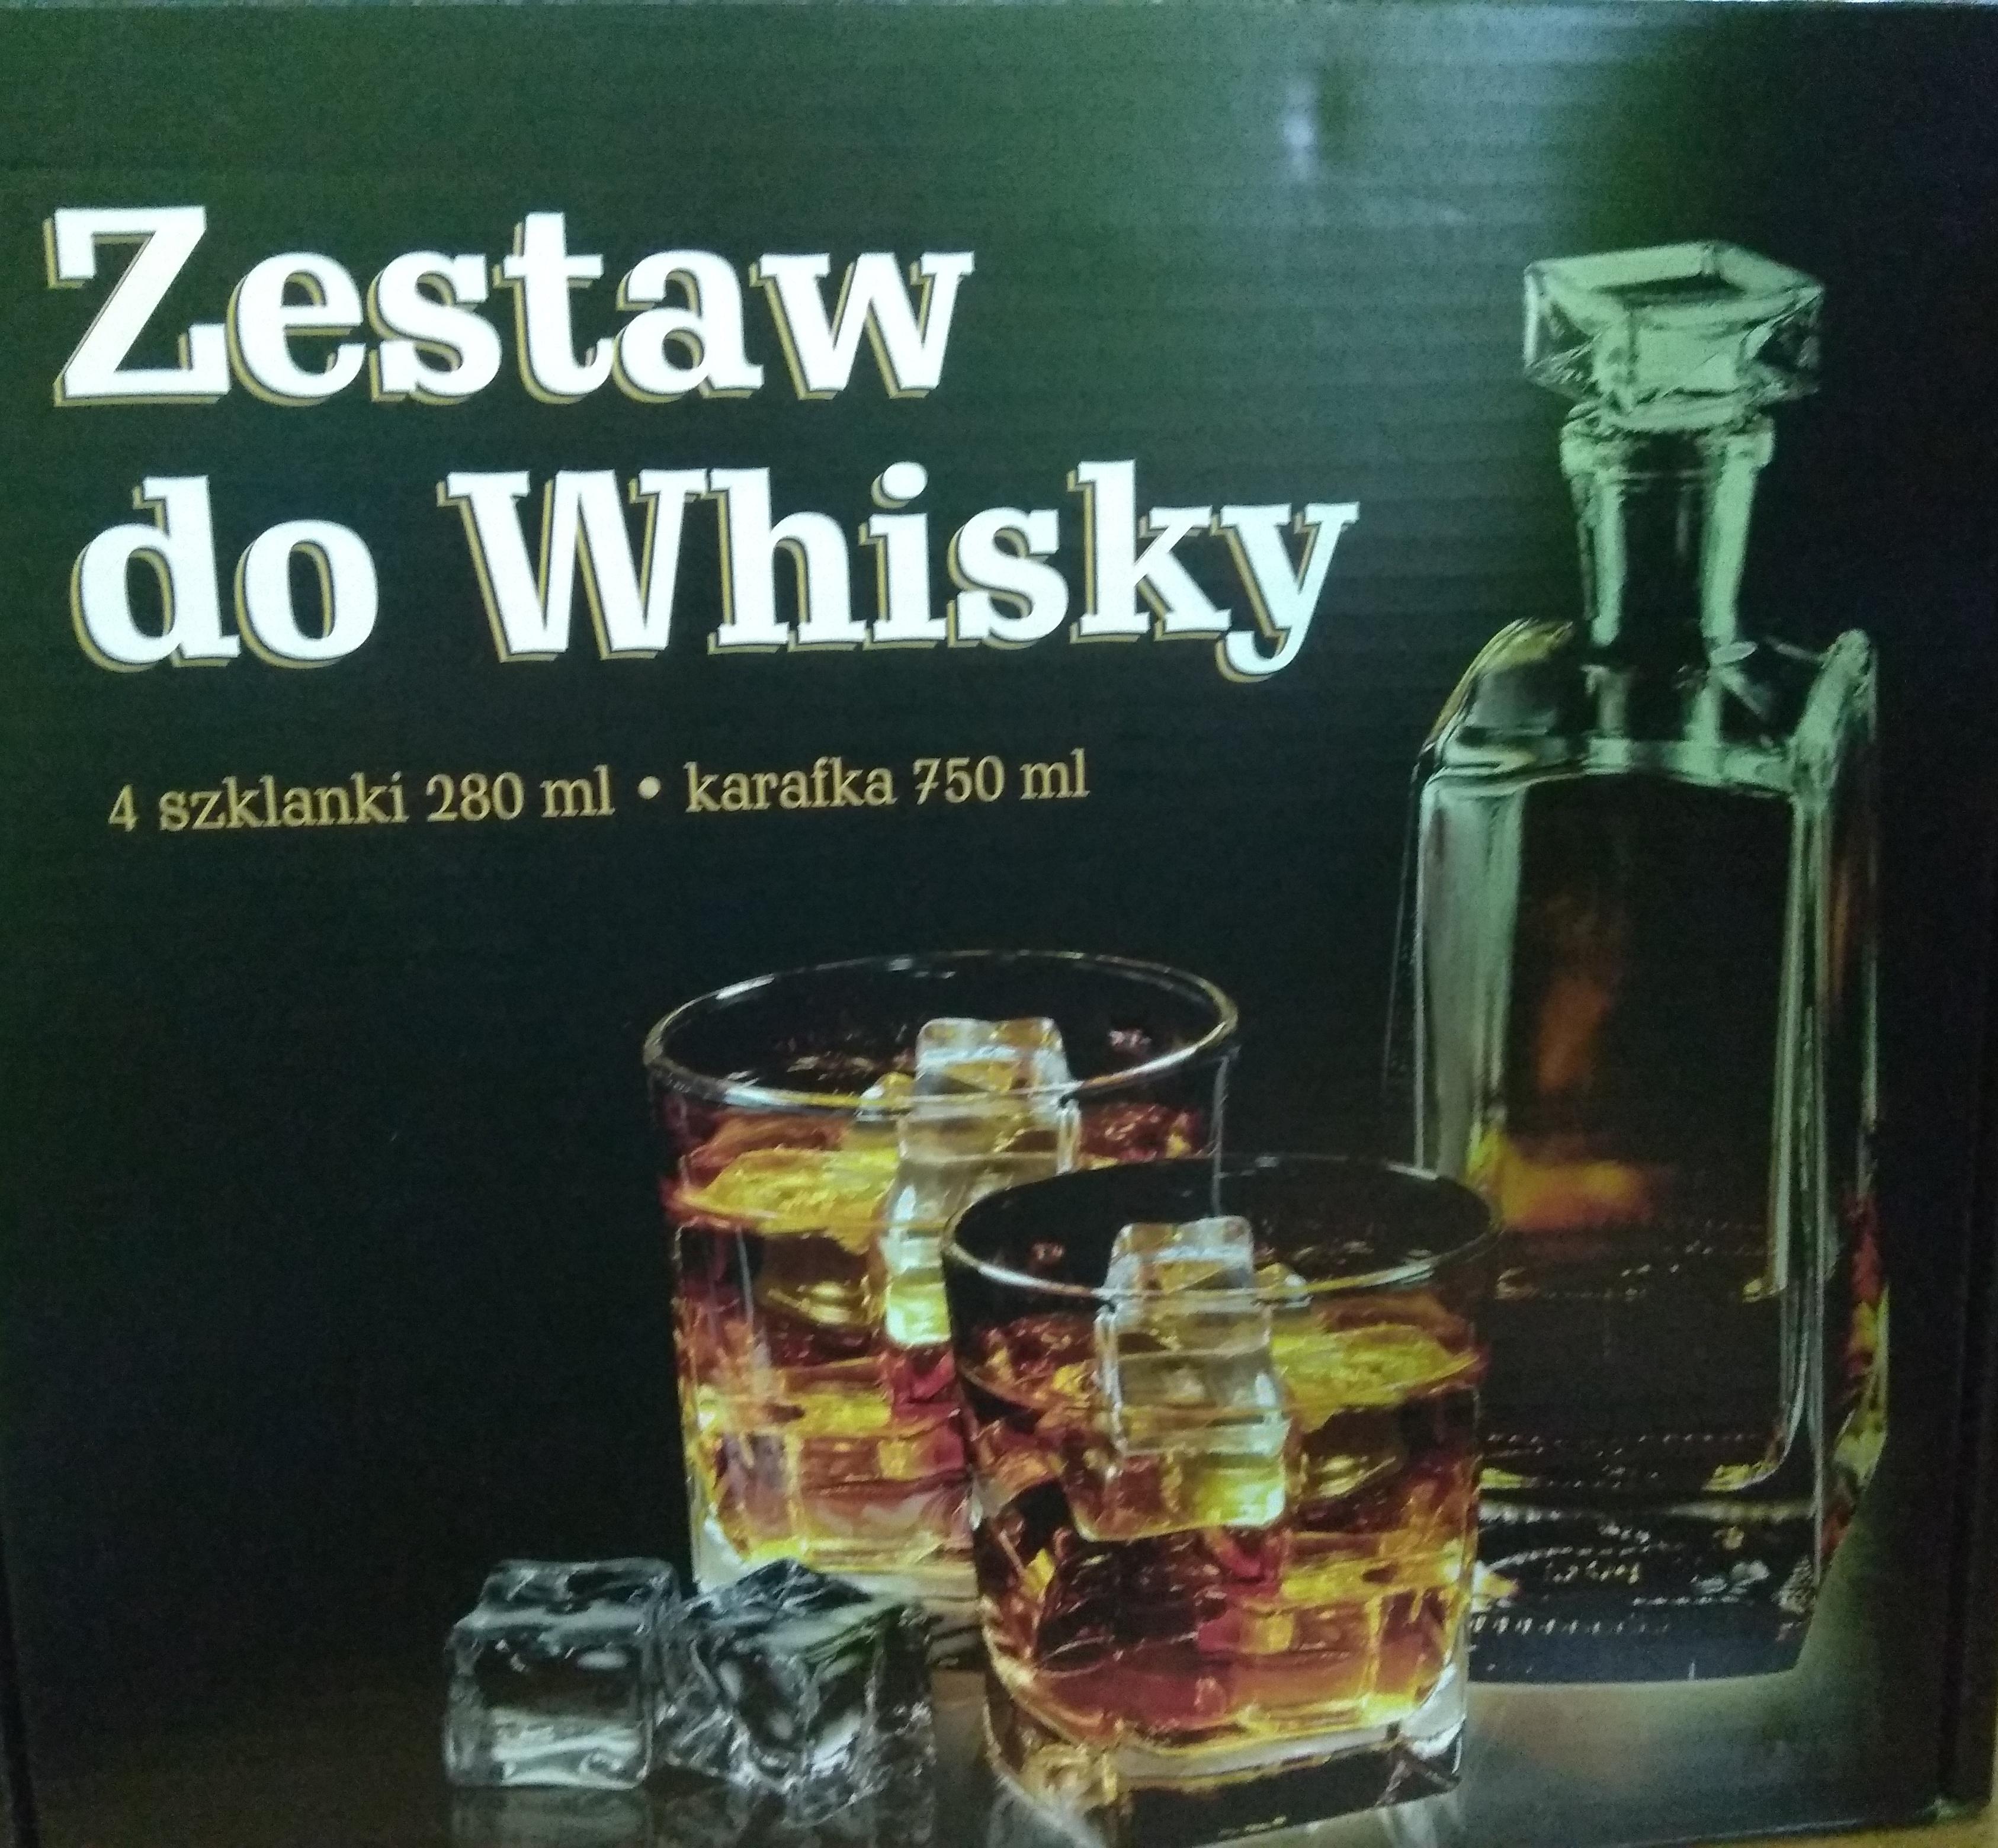 Zestaw do whisky Pepco